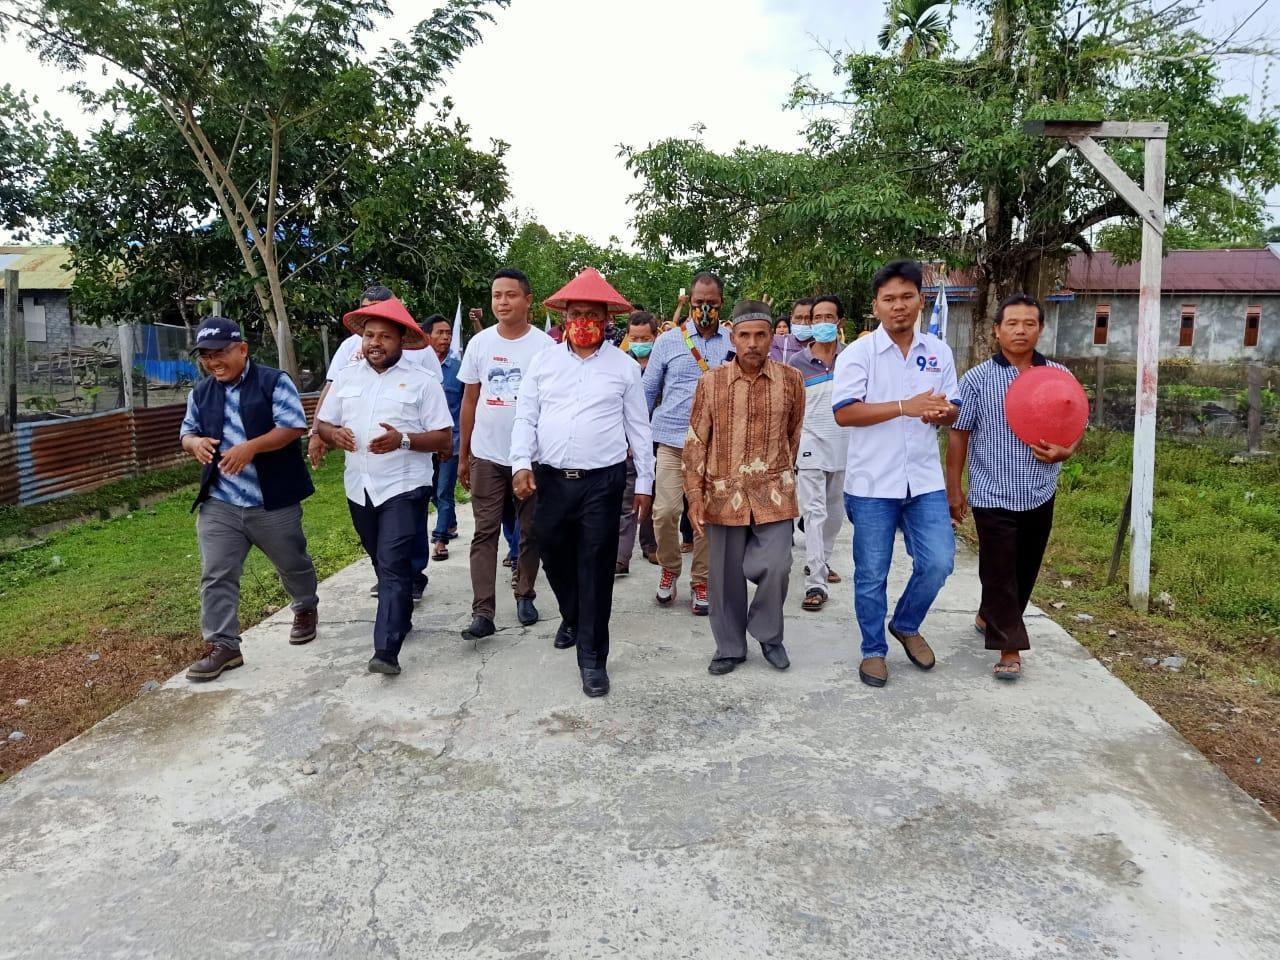 Keluh Jalan Rusak Sejak Tahun 1986, Warga Kampung Wariori Percaya Hermus-Edi Pimpin Manowari Pasti Peduli 1 IMG 20201127 WA0023